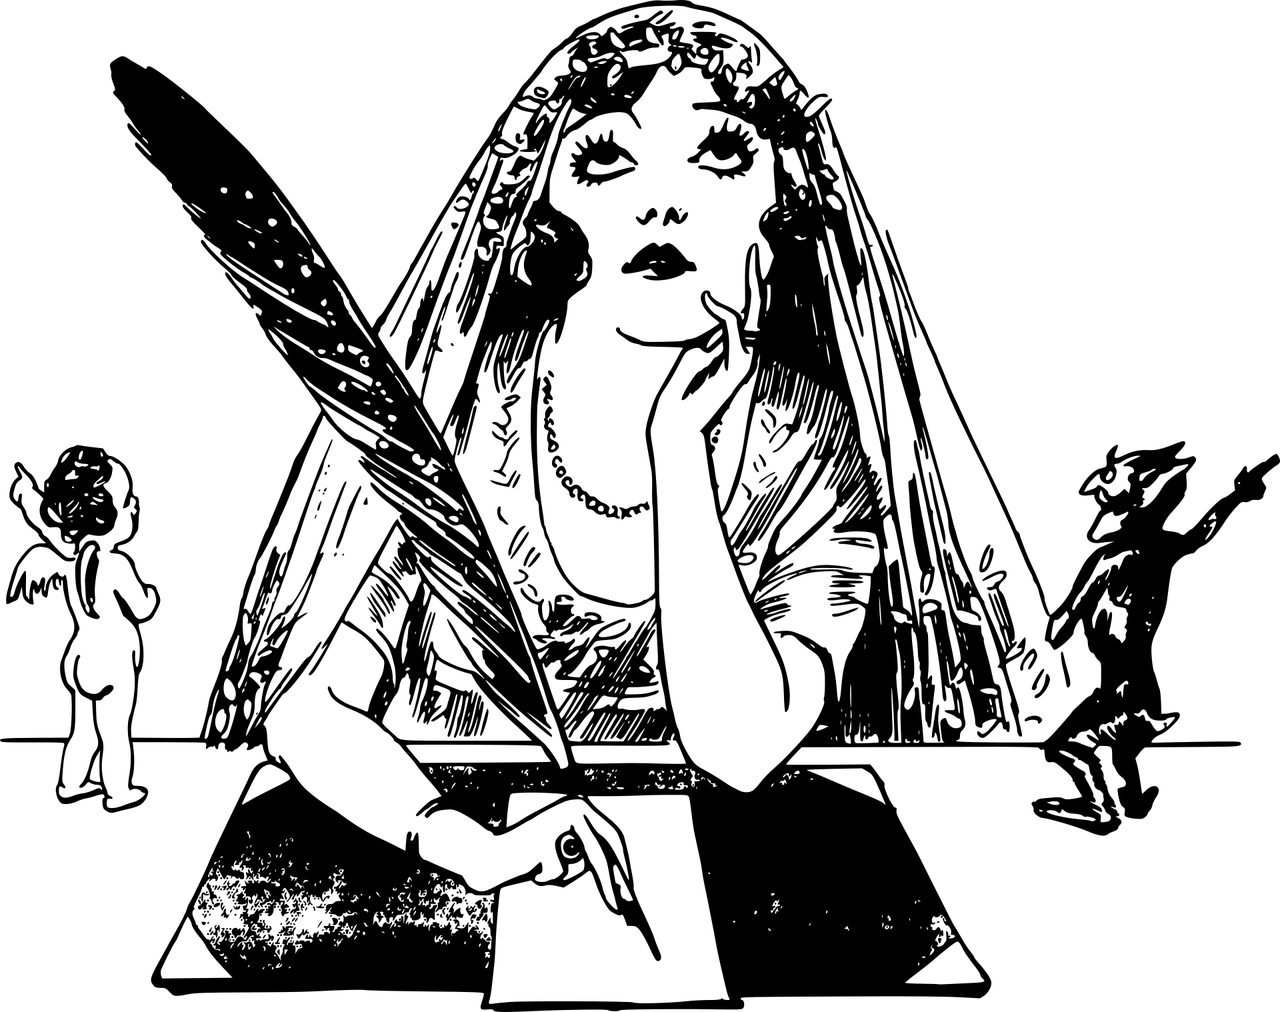 numéroscope-novembre-2020